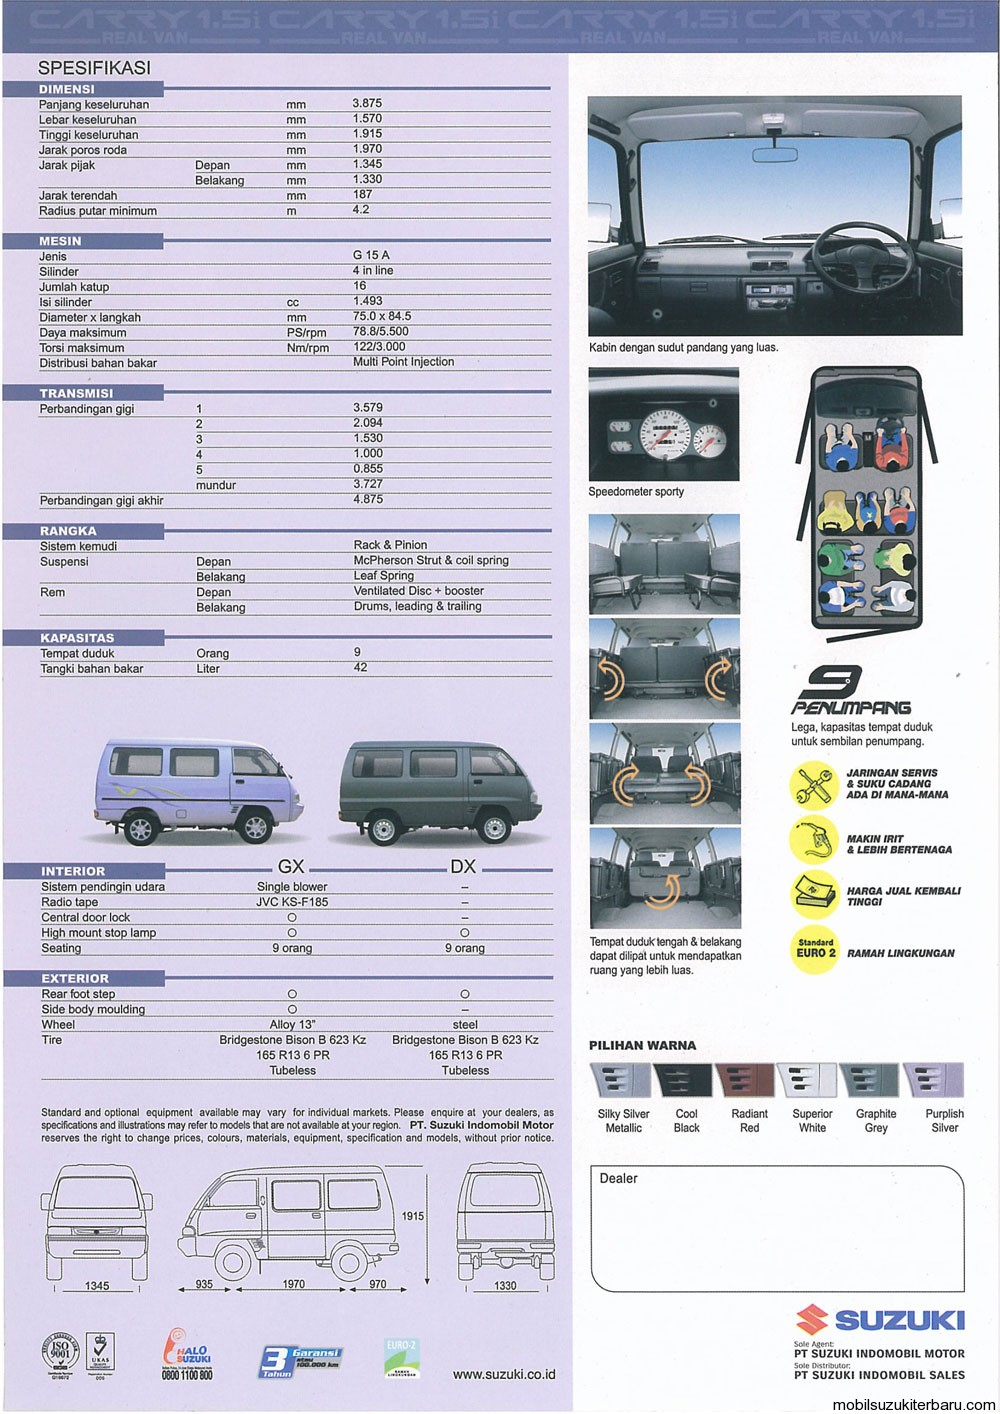 suzuki spesifikasi-carry-real-van.jpg